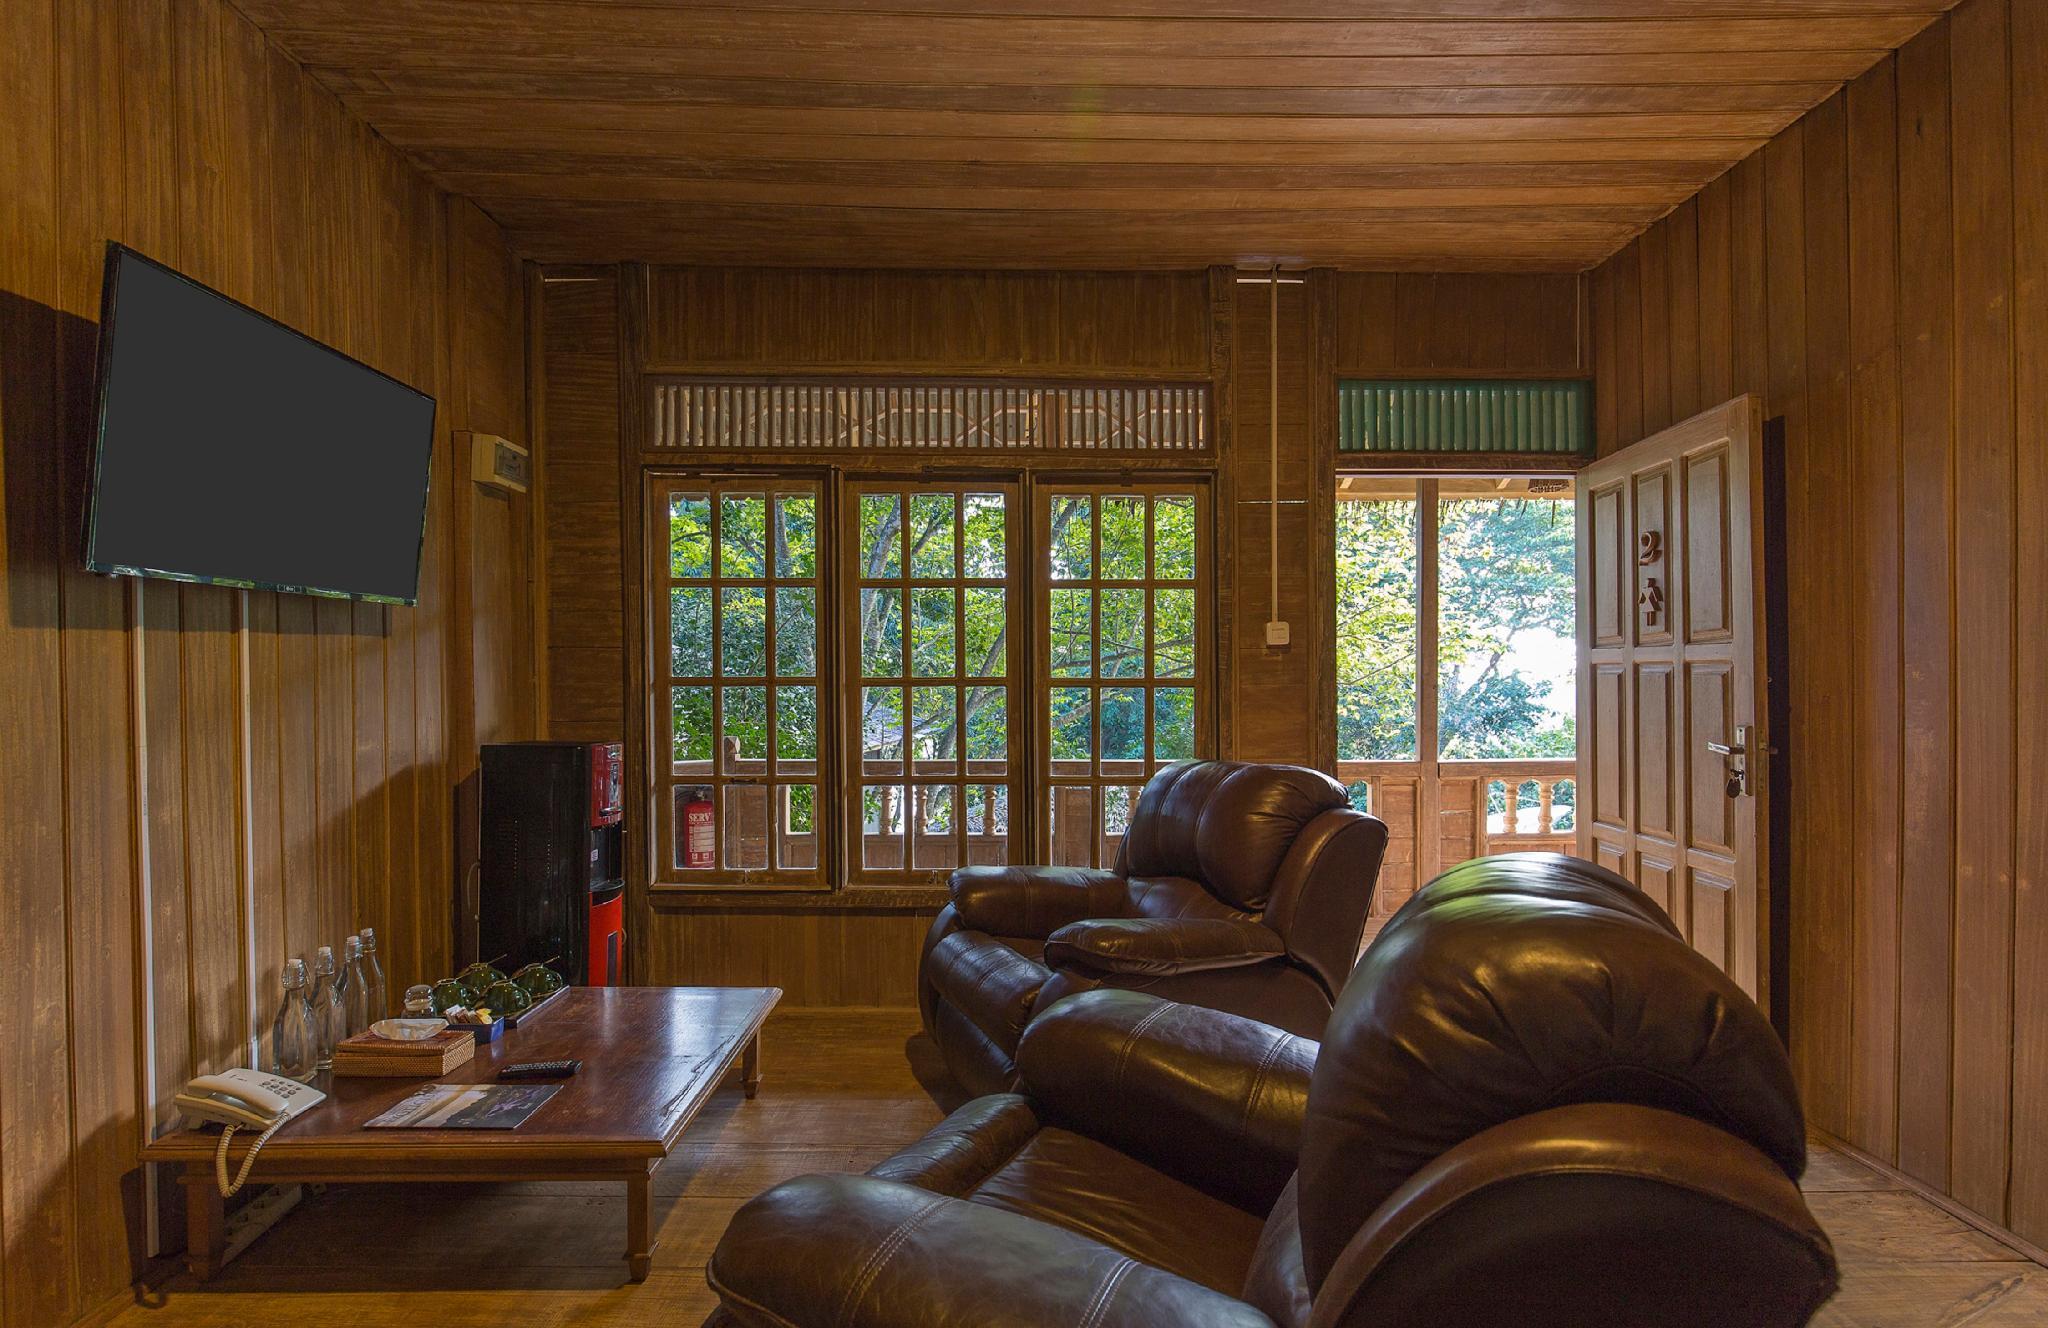 Dormitory Lodge @West Bali National Park